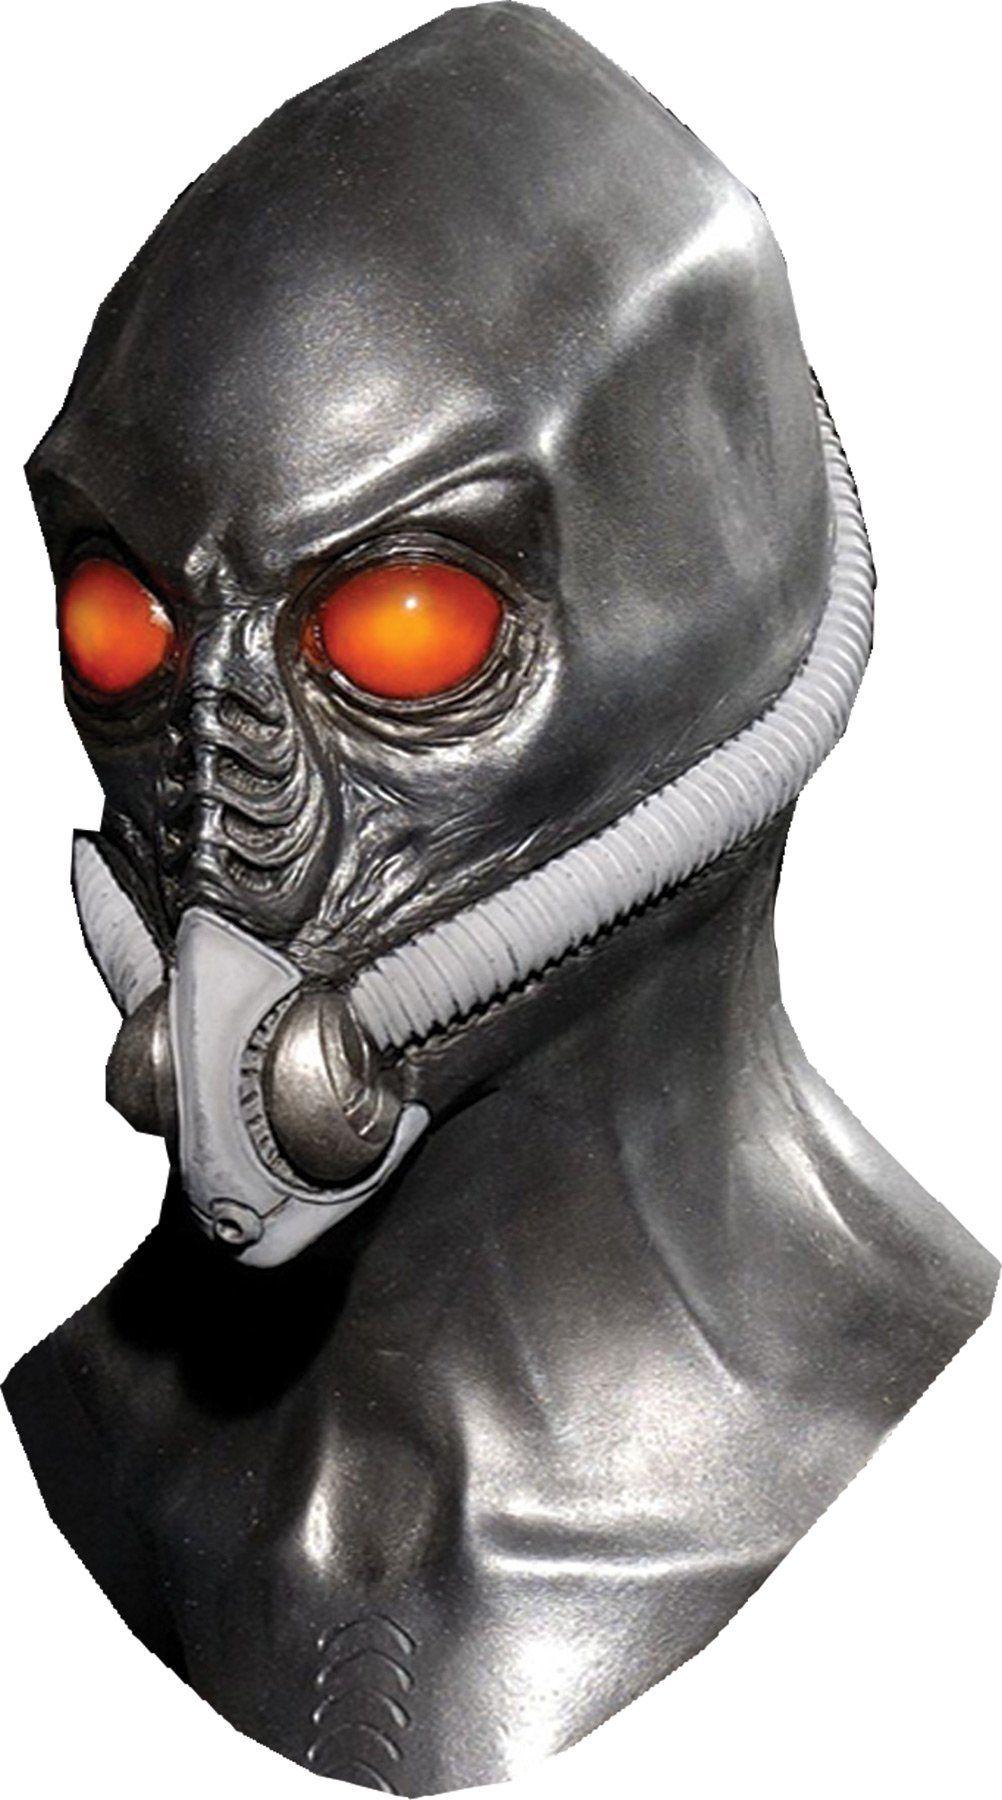 Time Traveler Resurrection Mask Morris costumes, Masks